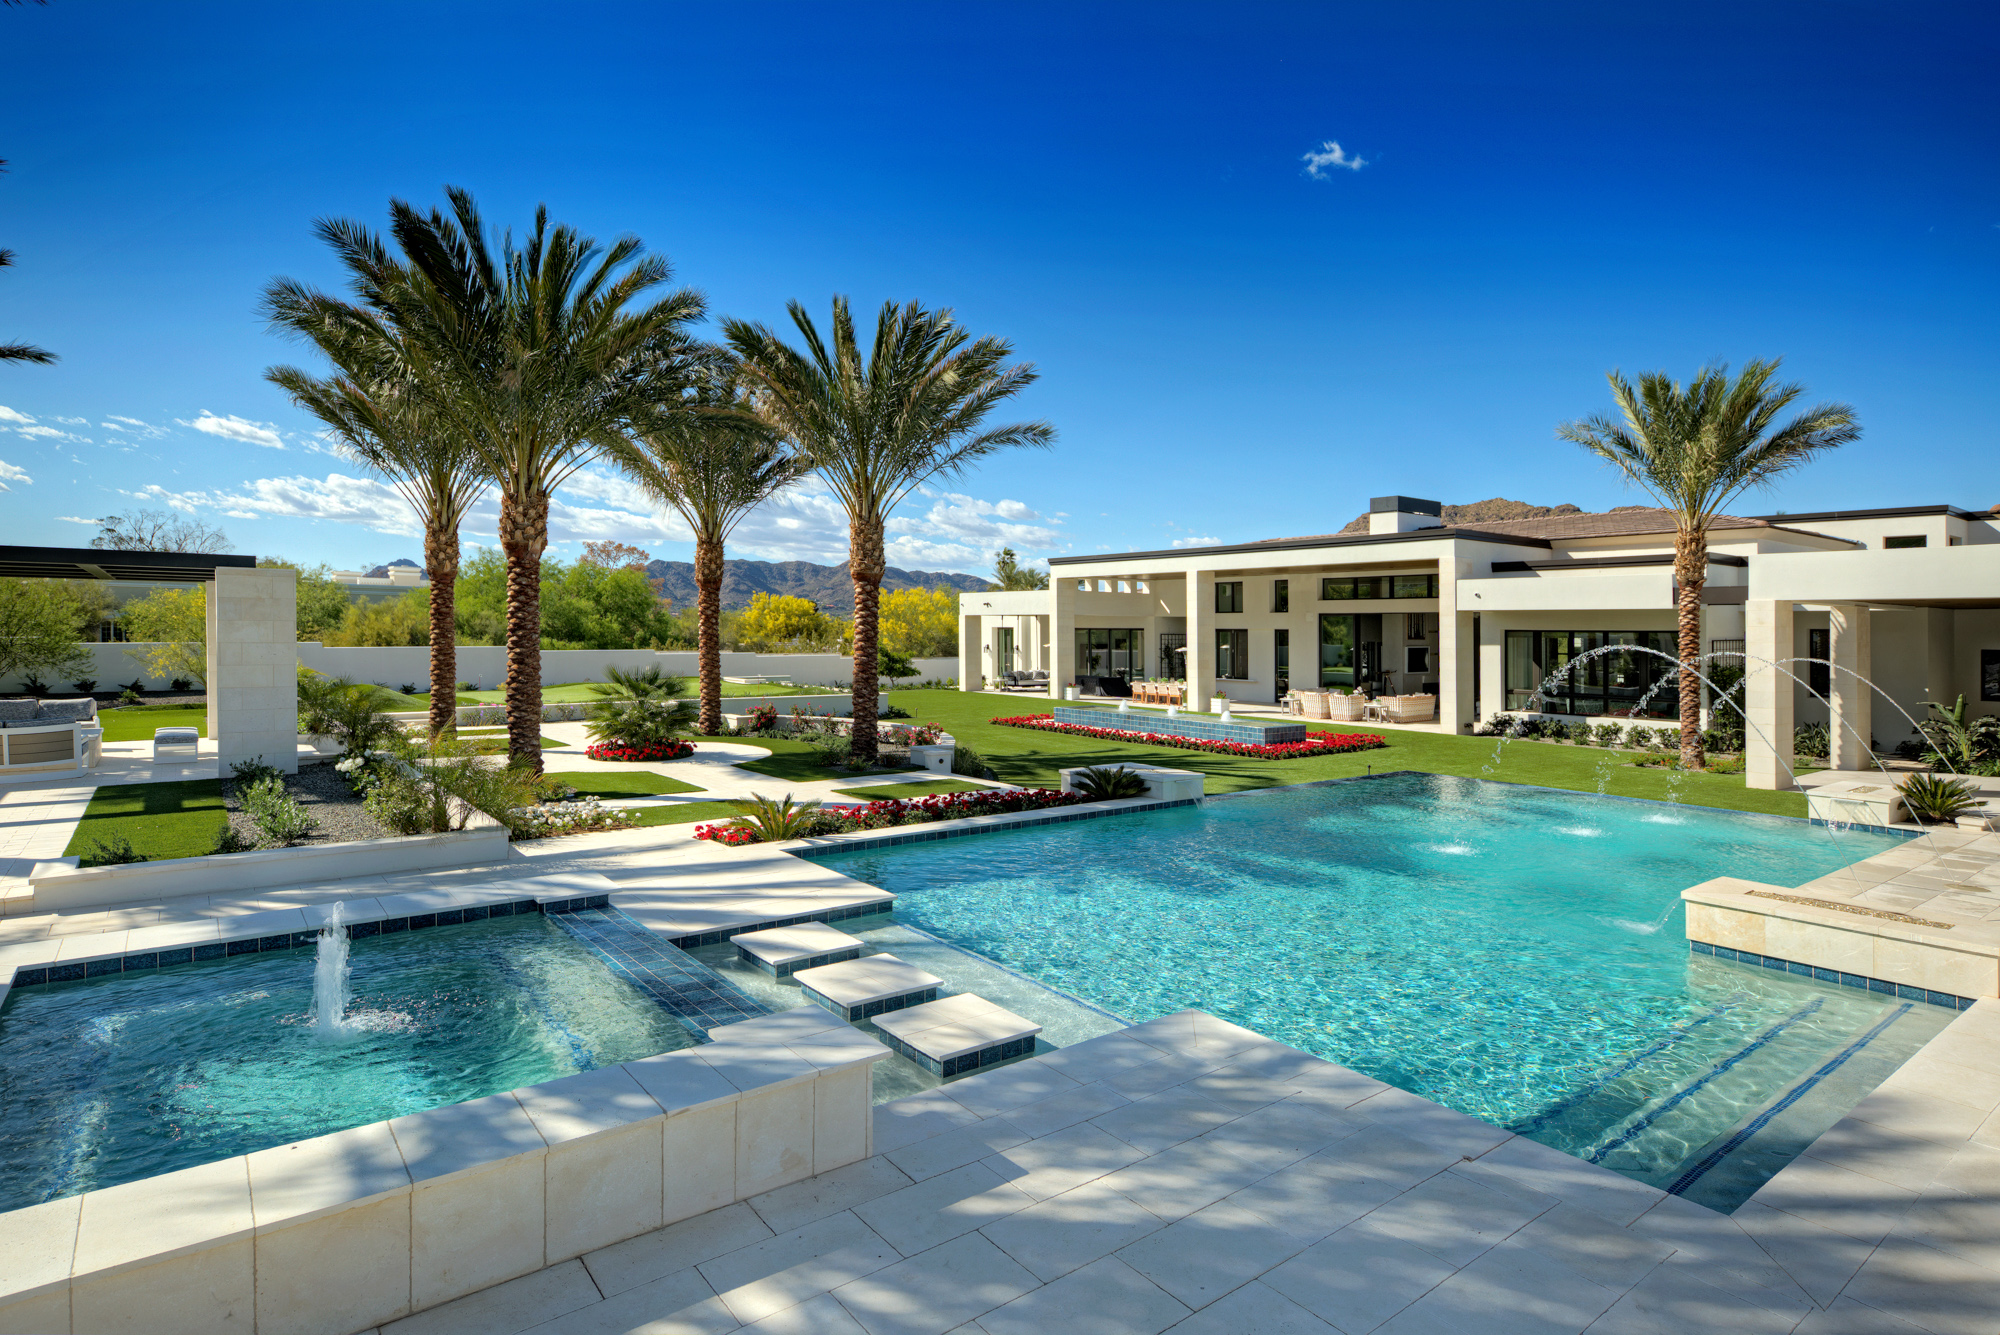 Luxury Backyards — Presidential Pools, Spas & Patio of Arizona on Luxury Backyard Design id=21307